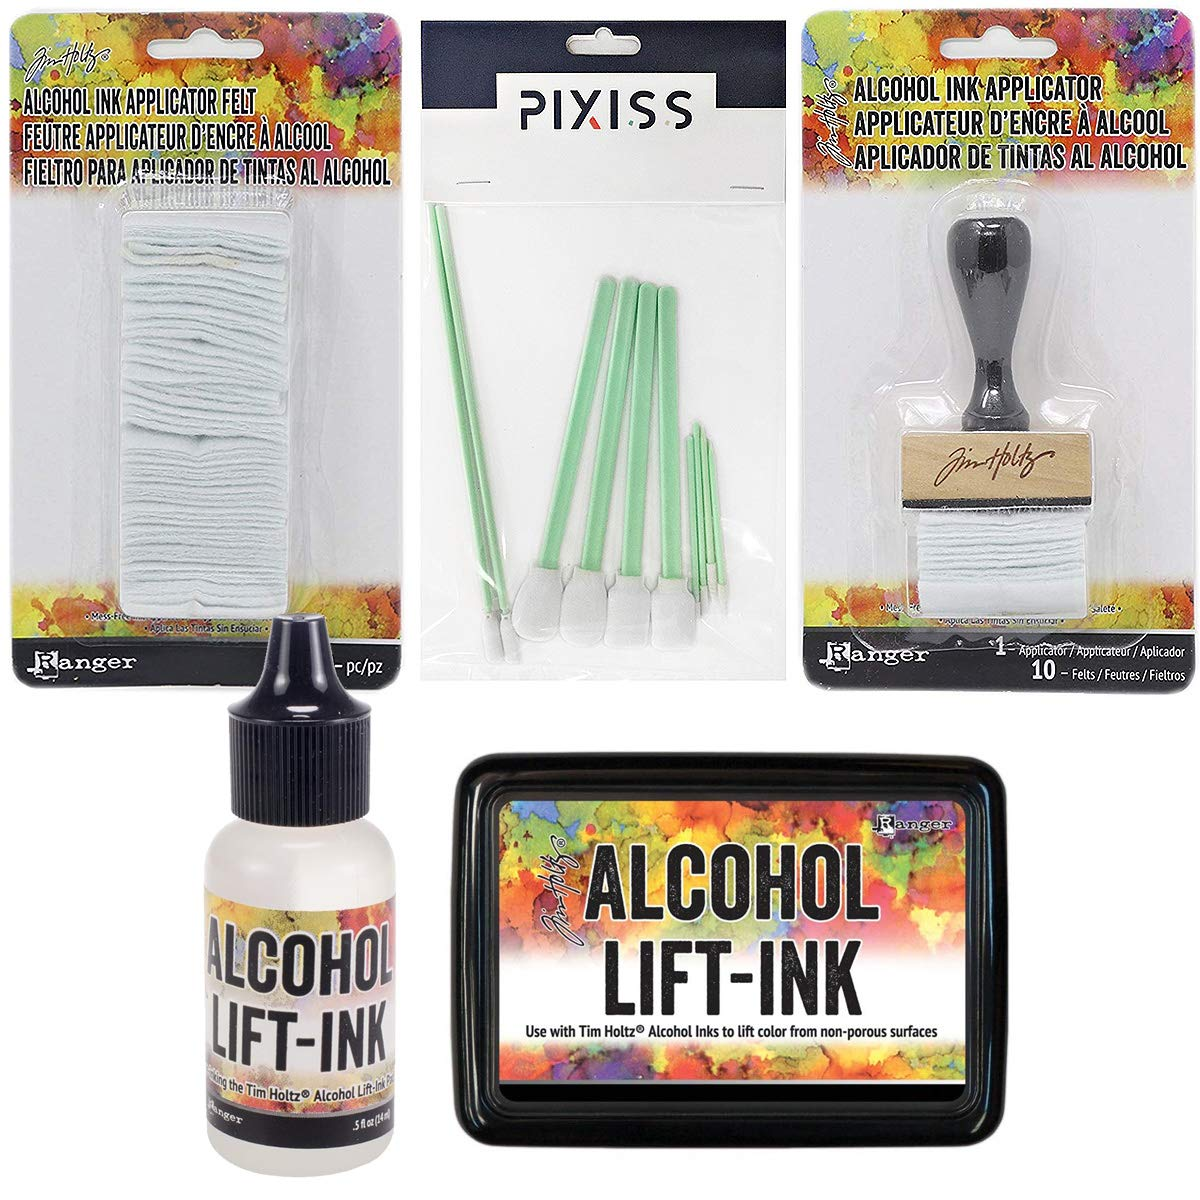 Ranger Tim Holtz Alcohol Ink Lift Ink Bundle, Alcohol Ink Applicator and 50pc Replacement Felt Pack, Lift-Ink Pad, 0.5-Ounce Alcohol Lift-Ink Reinker, 10x Pixiss Alcohol Ink Blending Tools